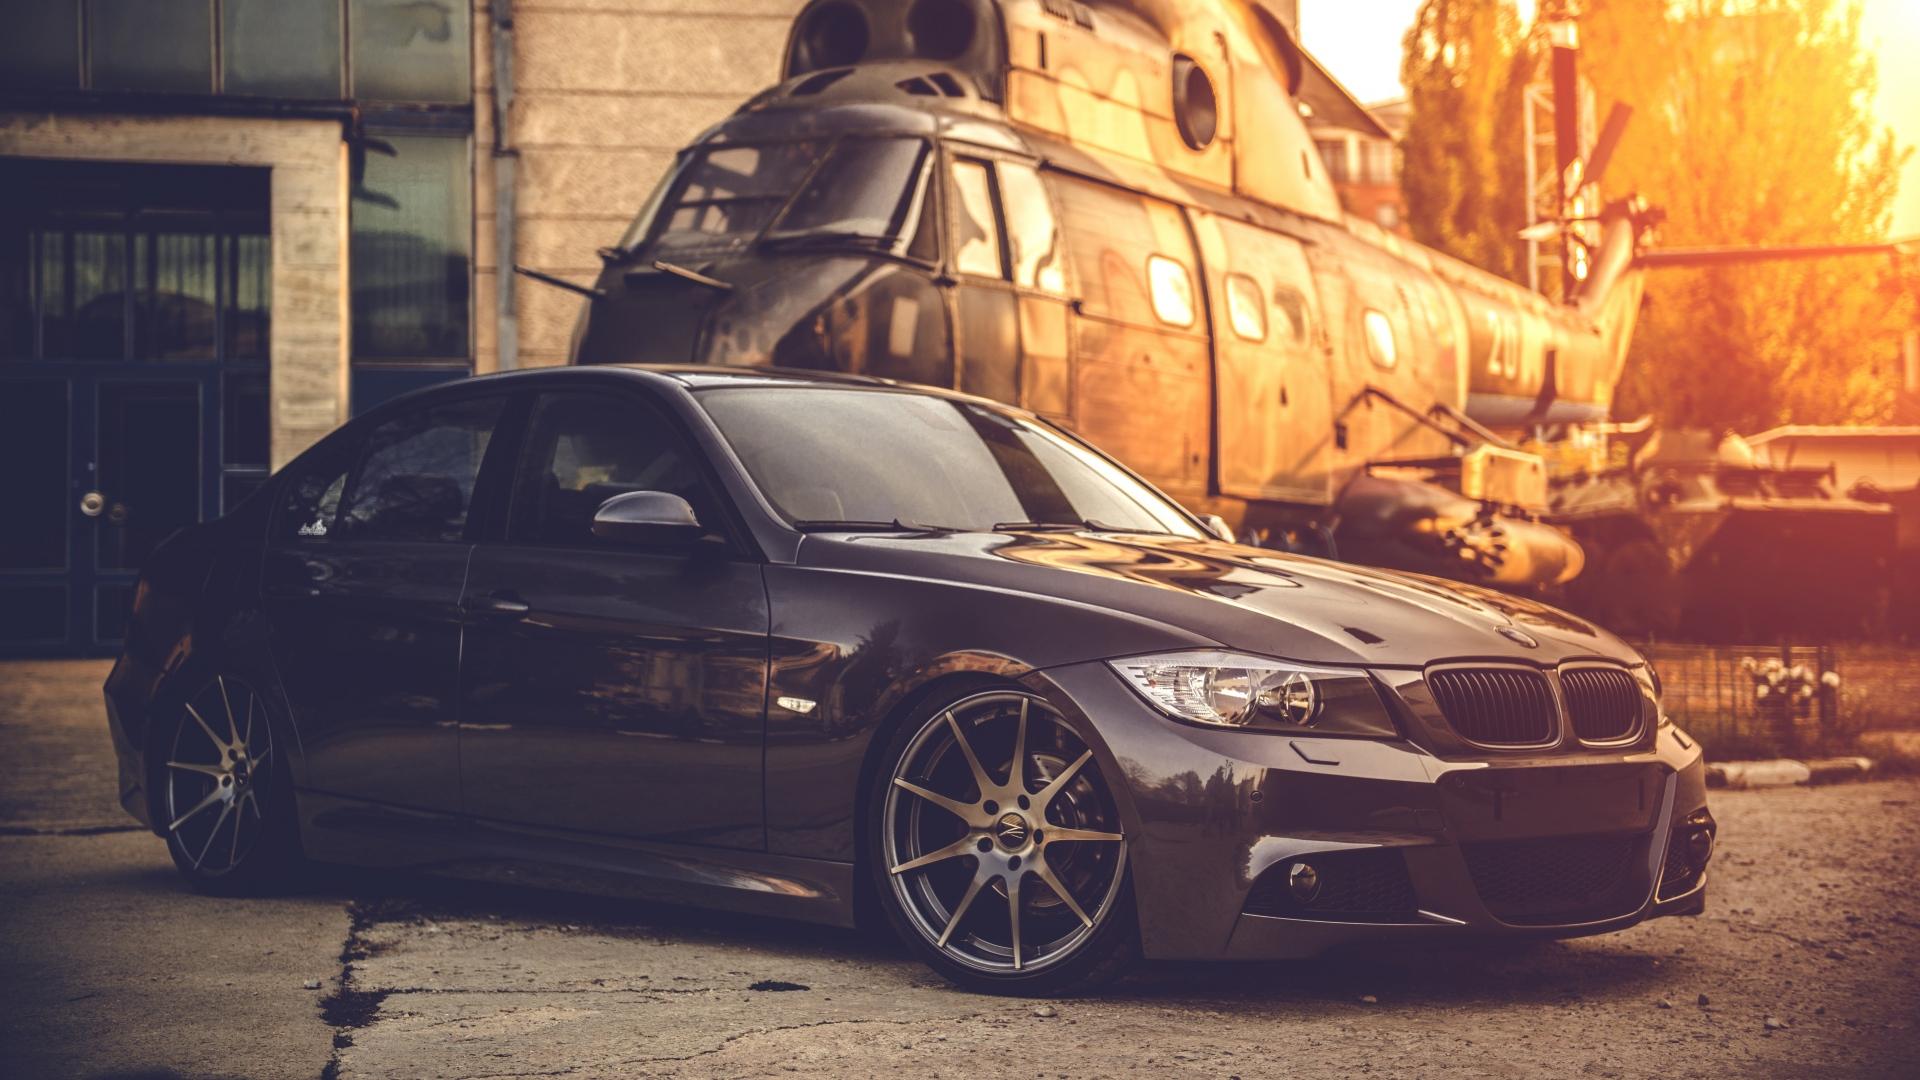 custom bmw car desktop wallpaper 62562